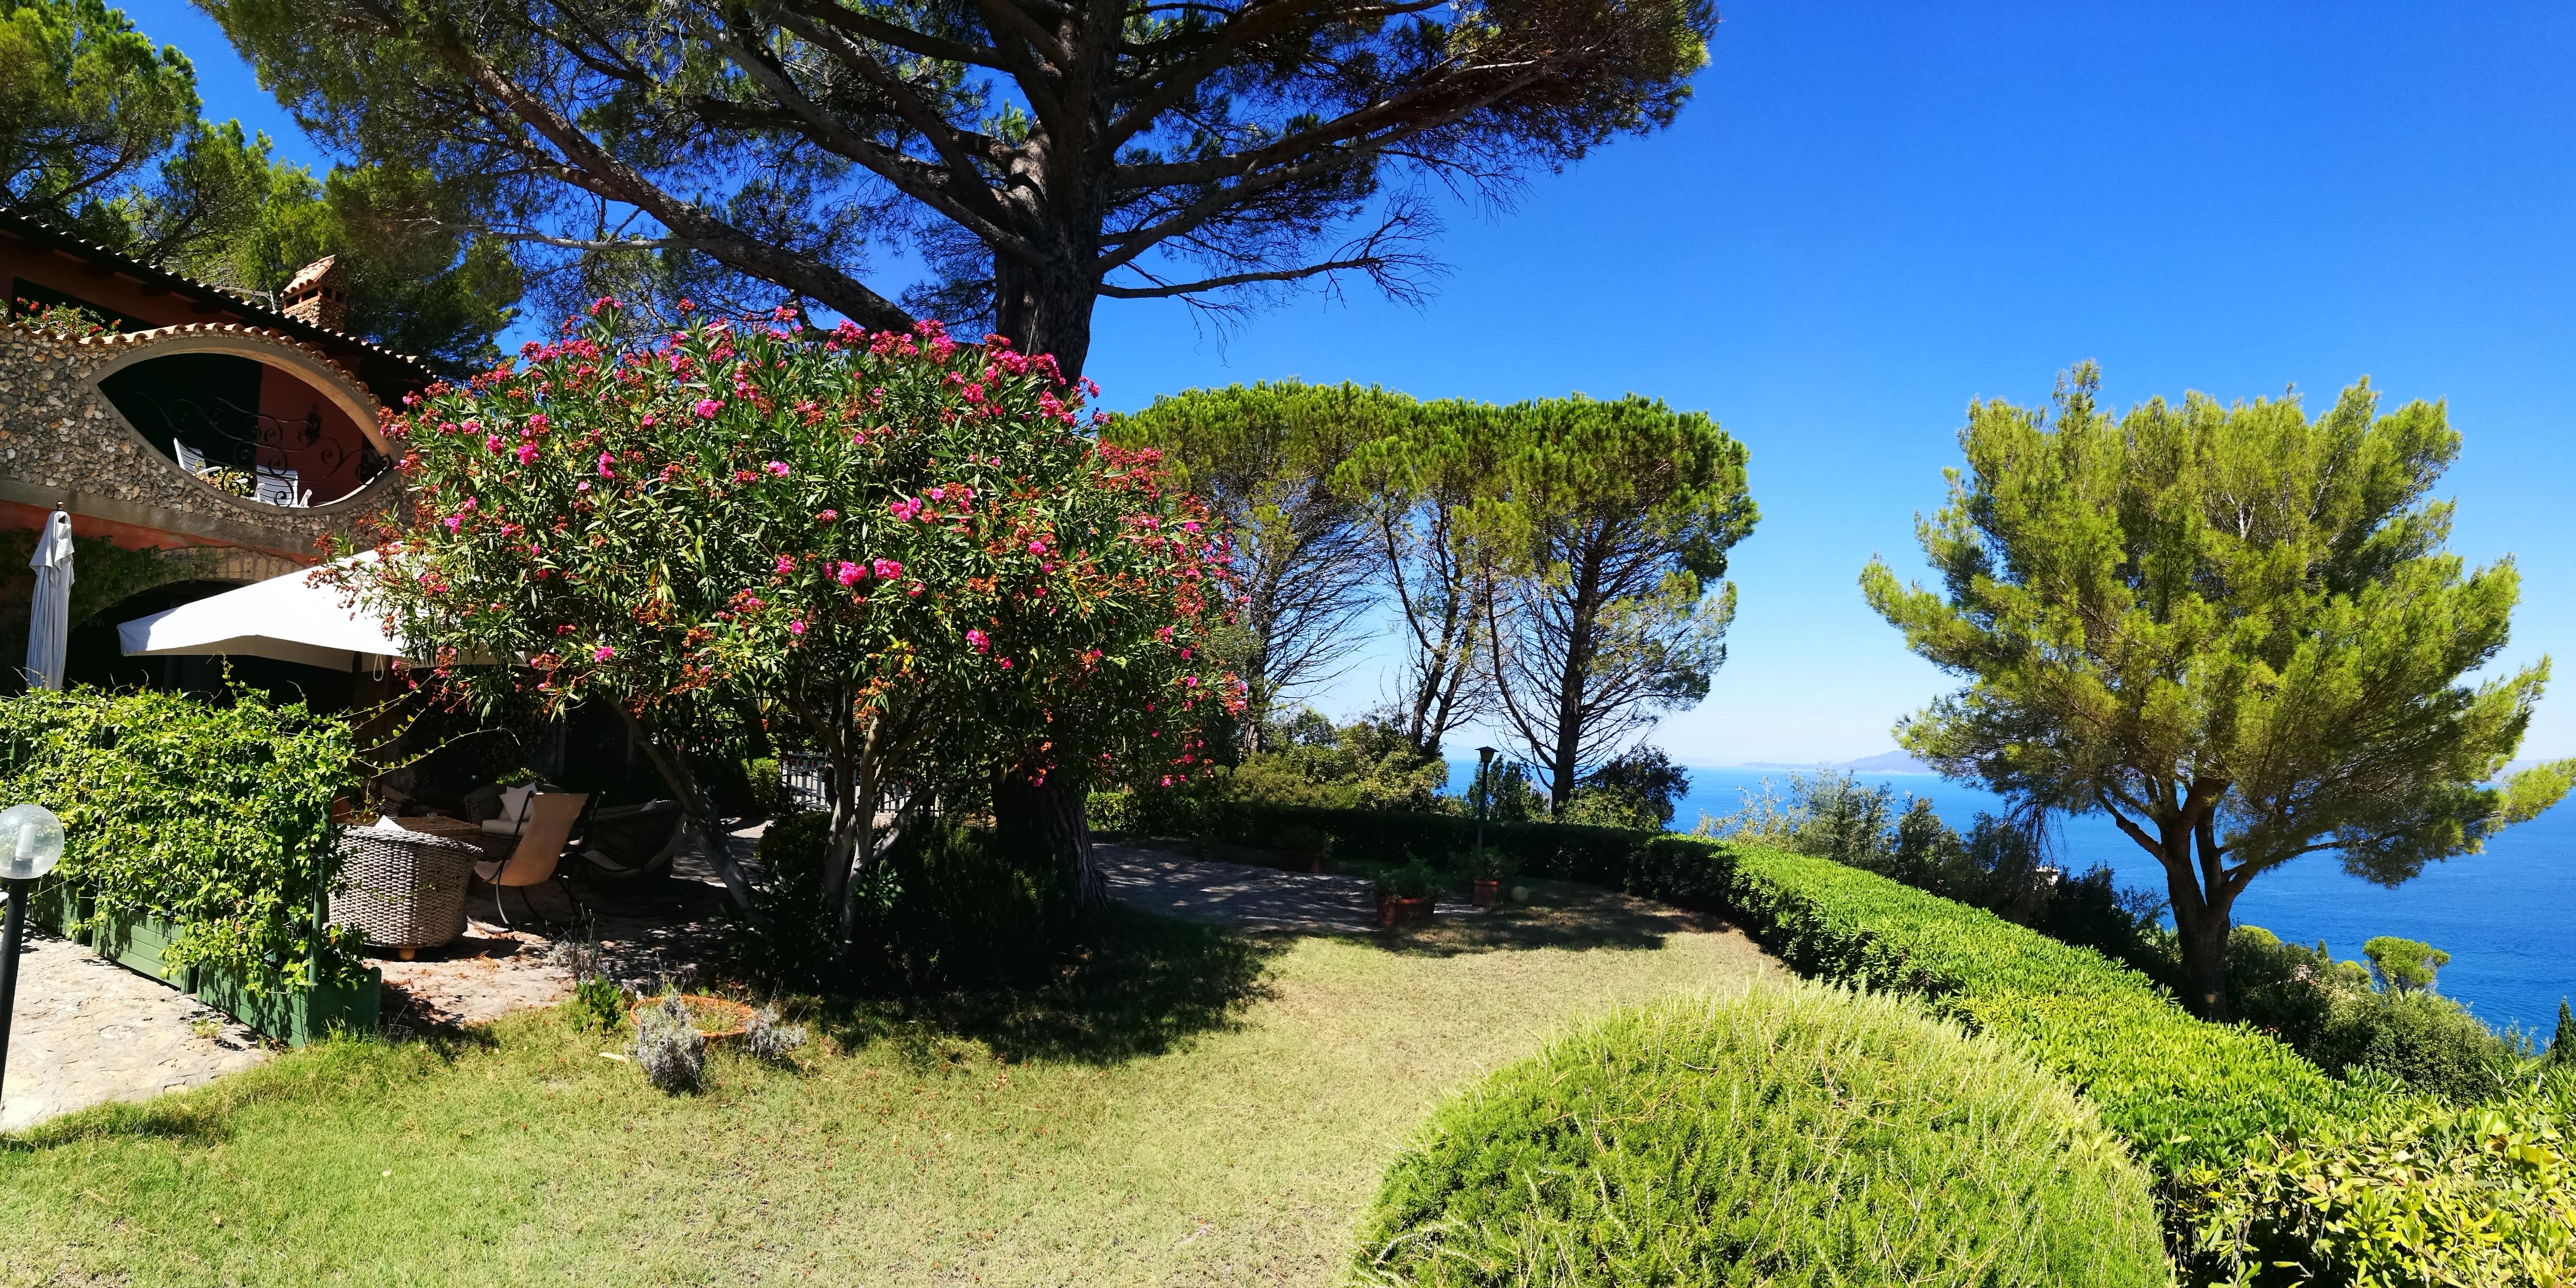 Vendita appartamento-villino stupenda vista mare, giardino, piscina, posti auto Porto S. Stefano Argentario.